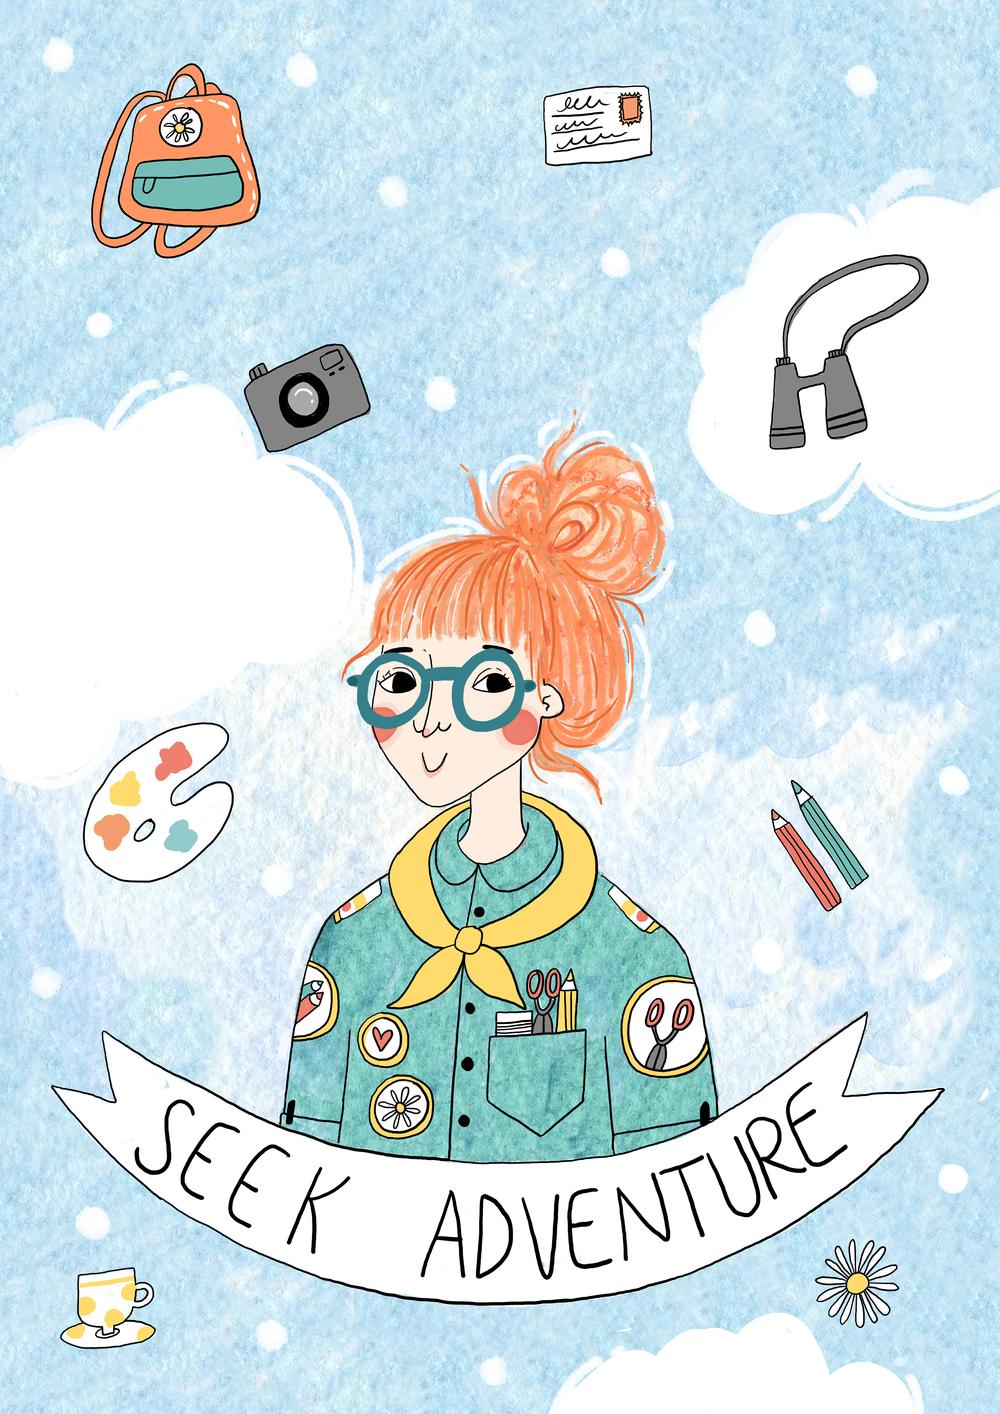 seekadventure a6 postcard.jpg